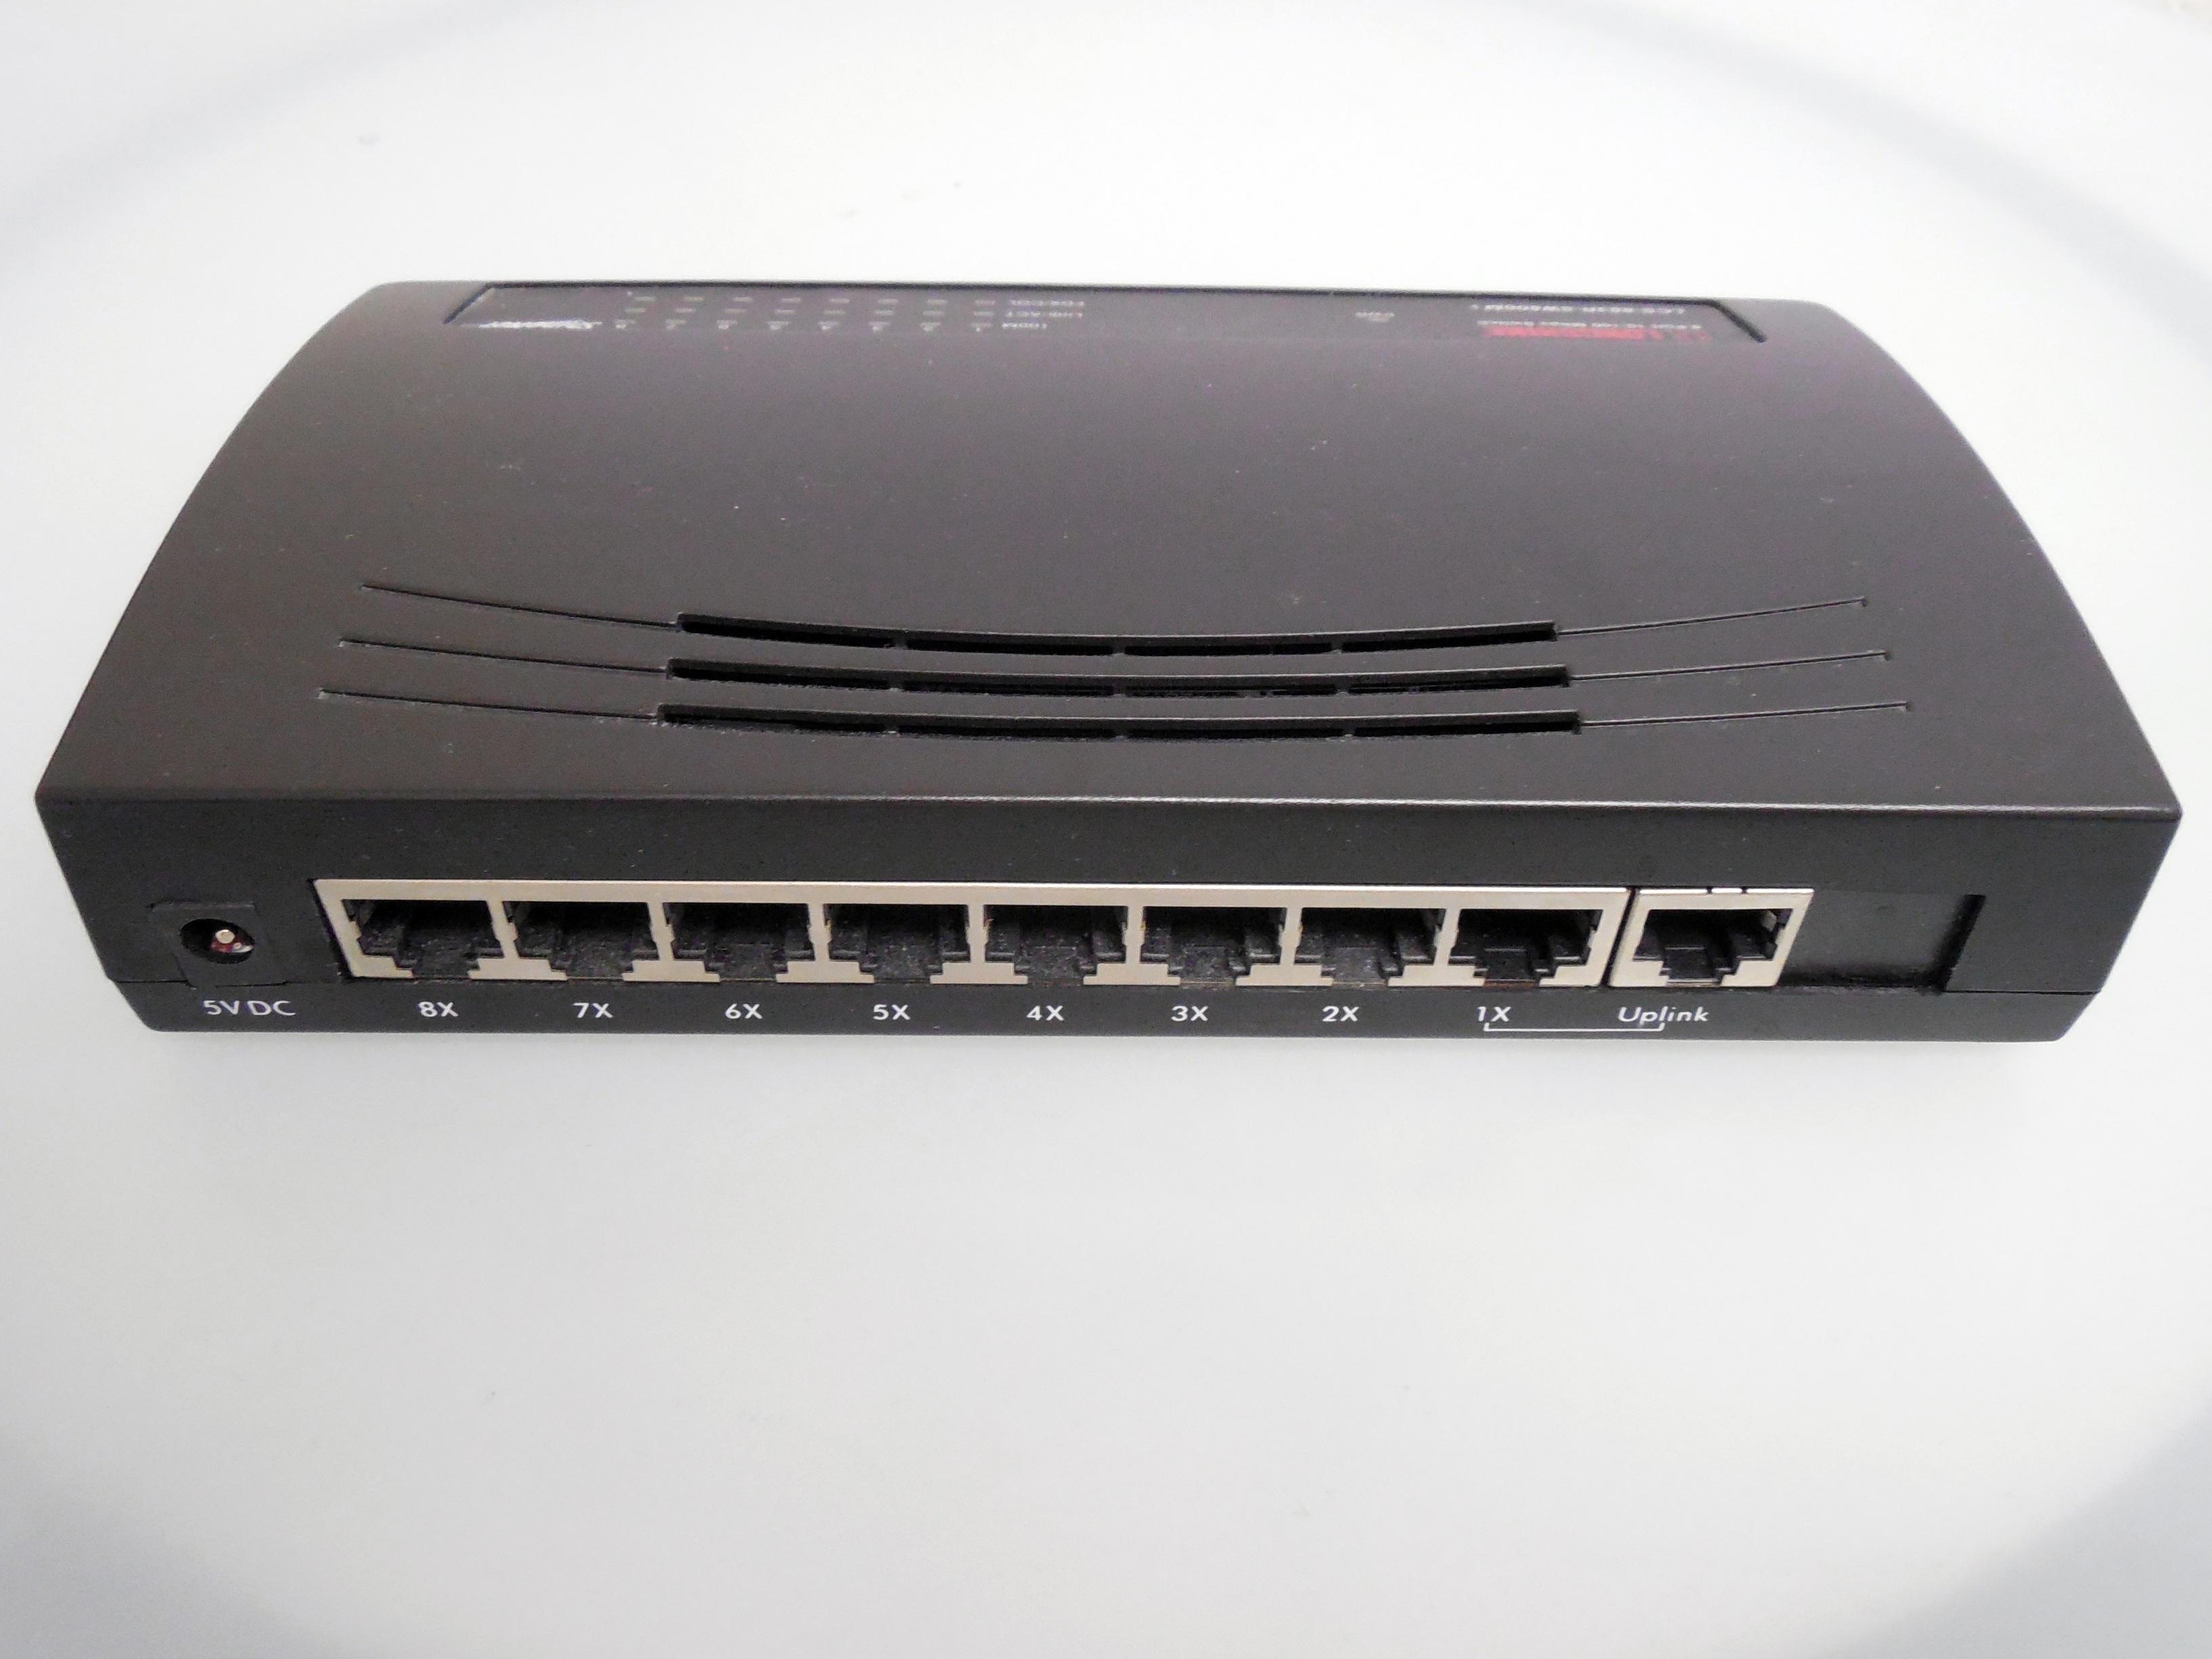 Gambar Teknologi Internet Kantor Alat Router Pc Administrasi